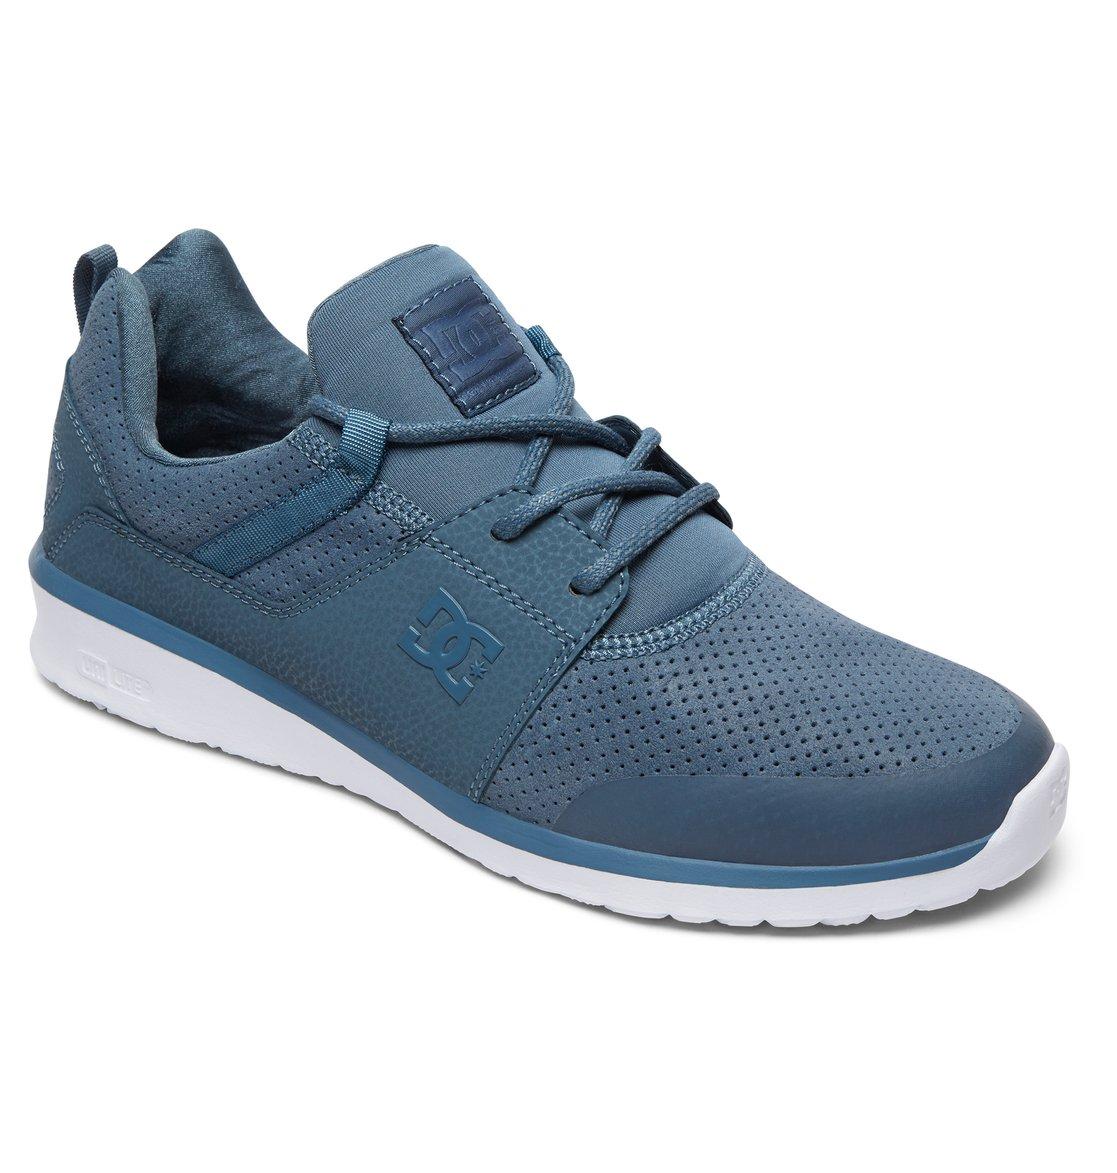 4c1704f0c9 1 Tenis Masculino DC Shoes Heathrow Prestige Azul BRADYS700084 DC Shoes